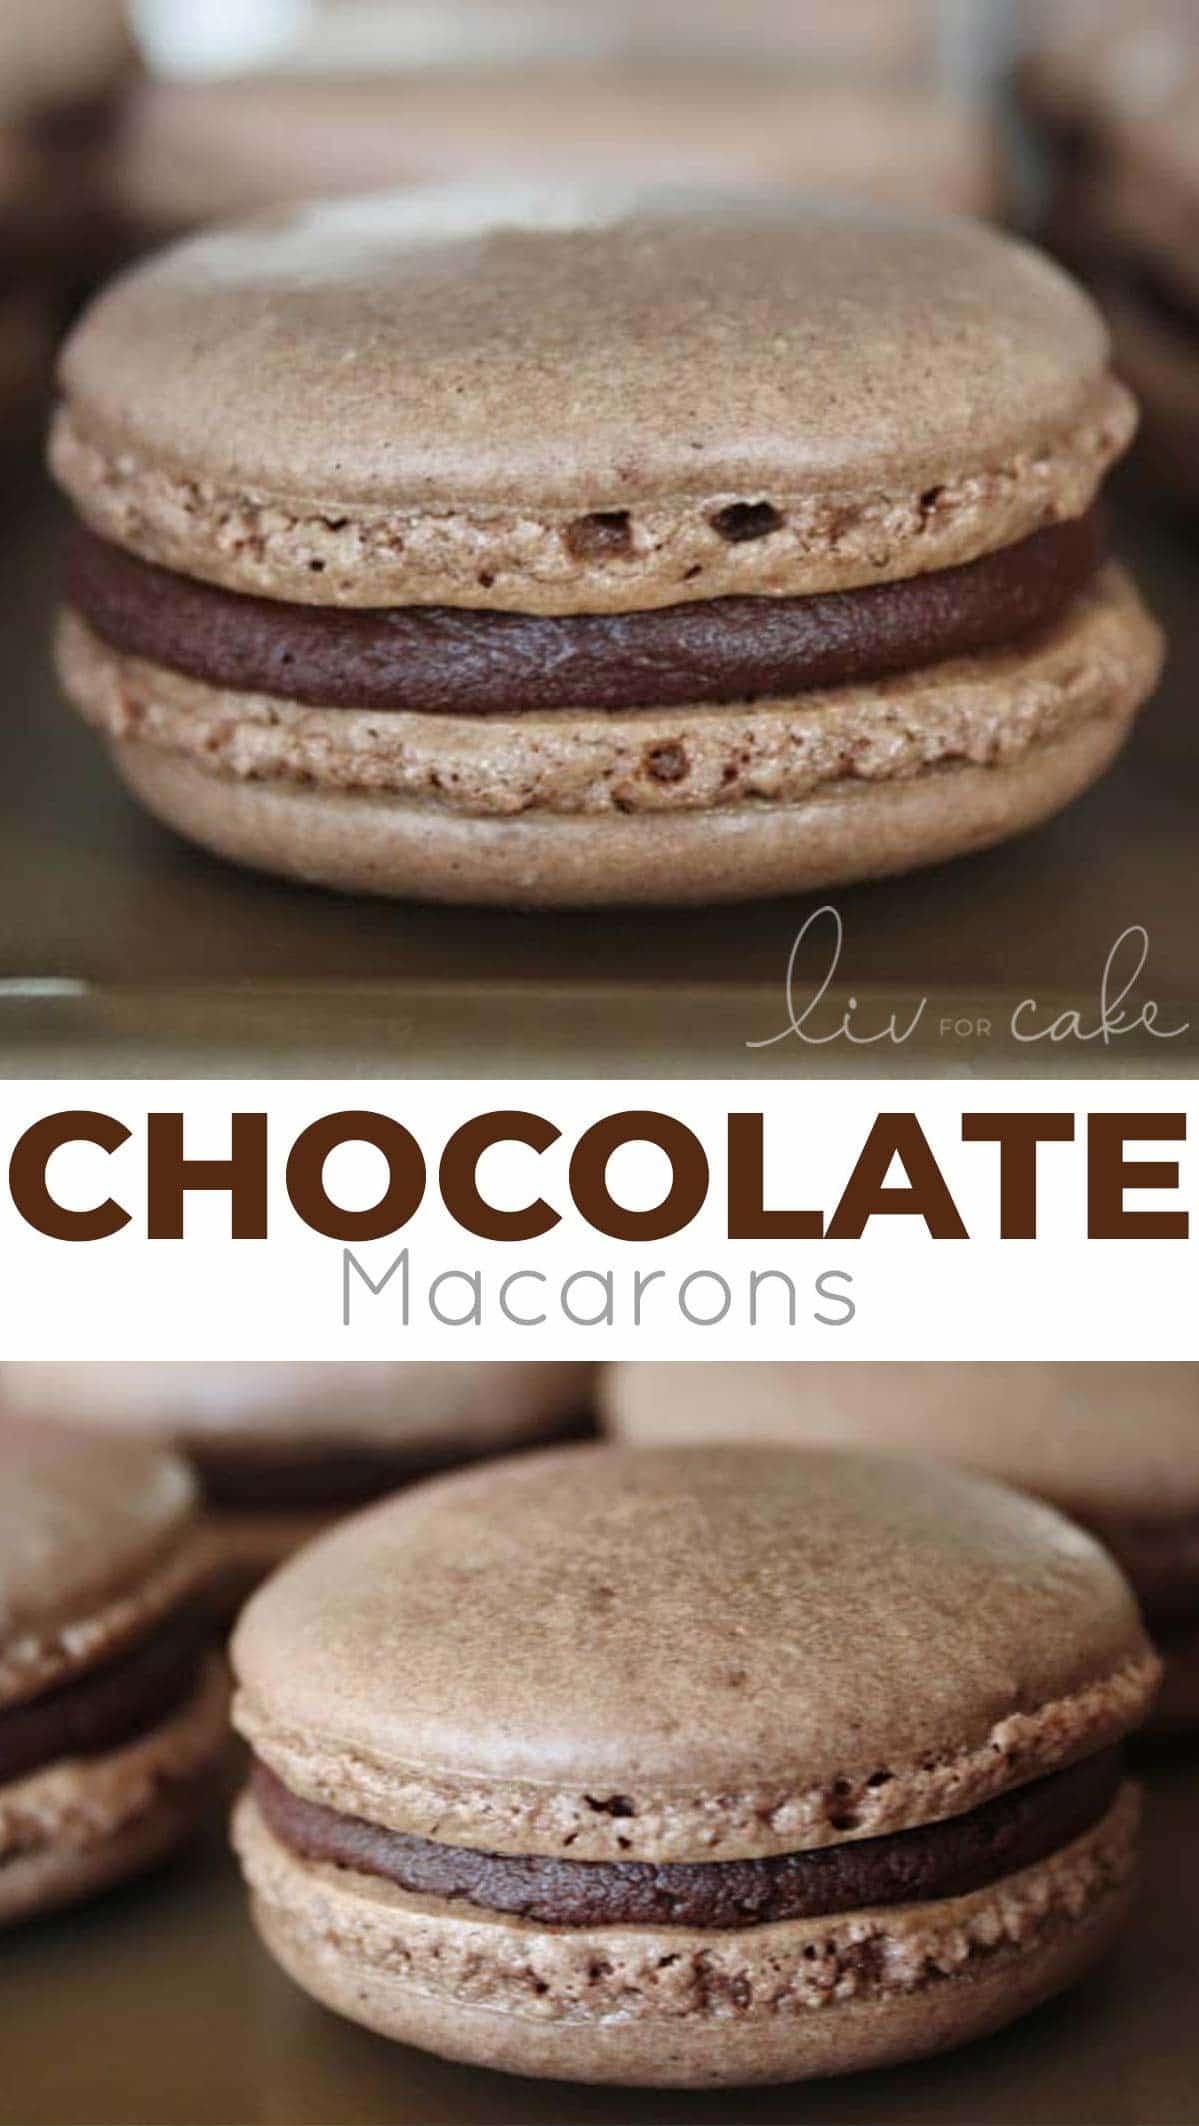 Chocolate macarons collage